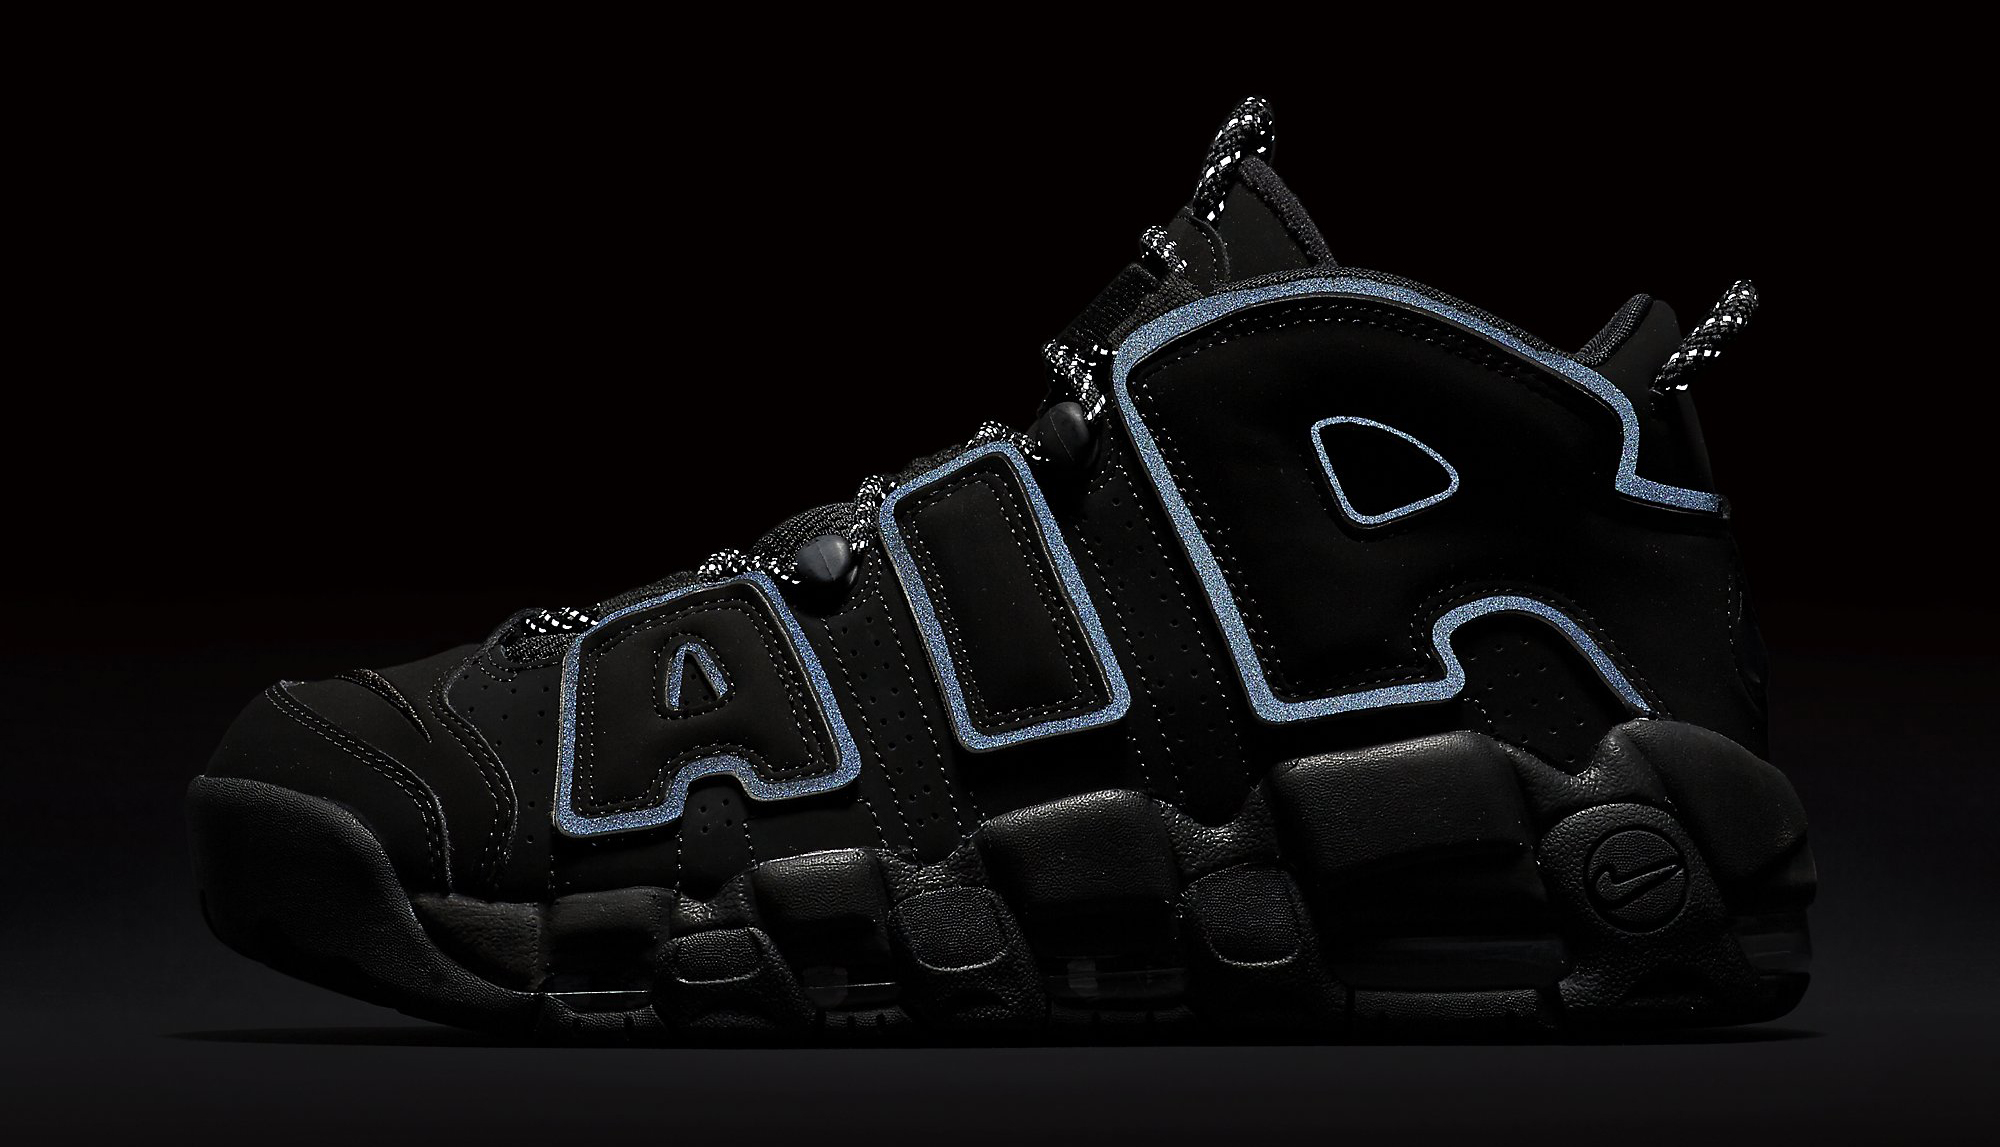 Nike Air More Uptempo Black Reflective 414962-004 3M